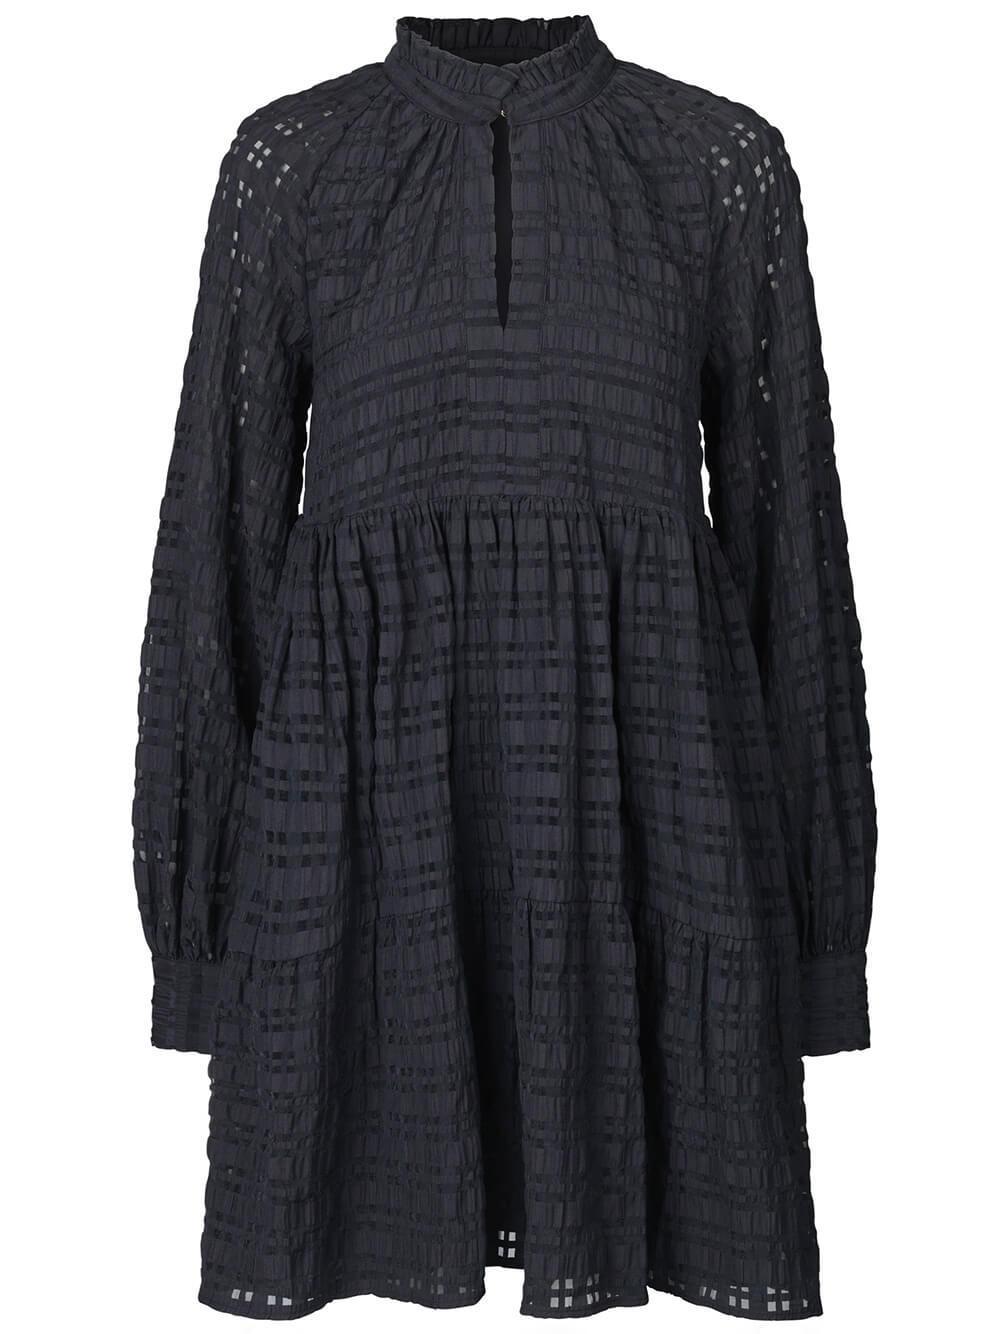 Jasmine Gingham Dress